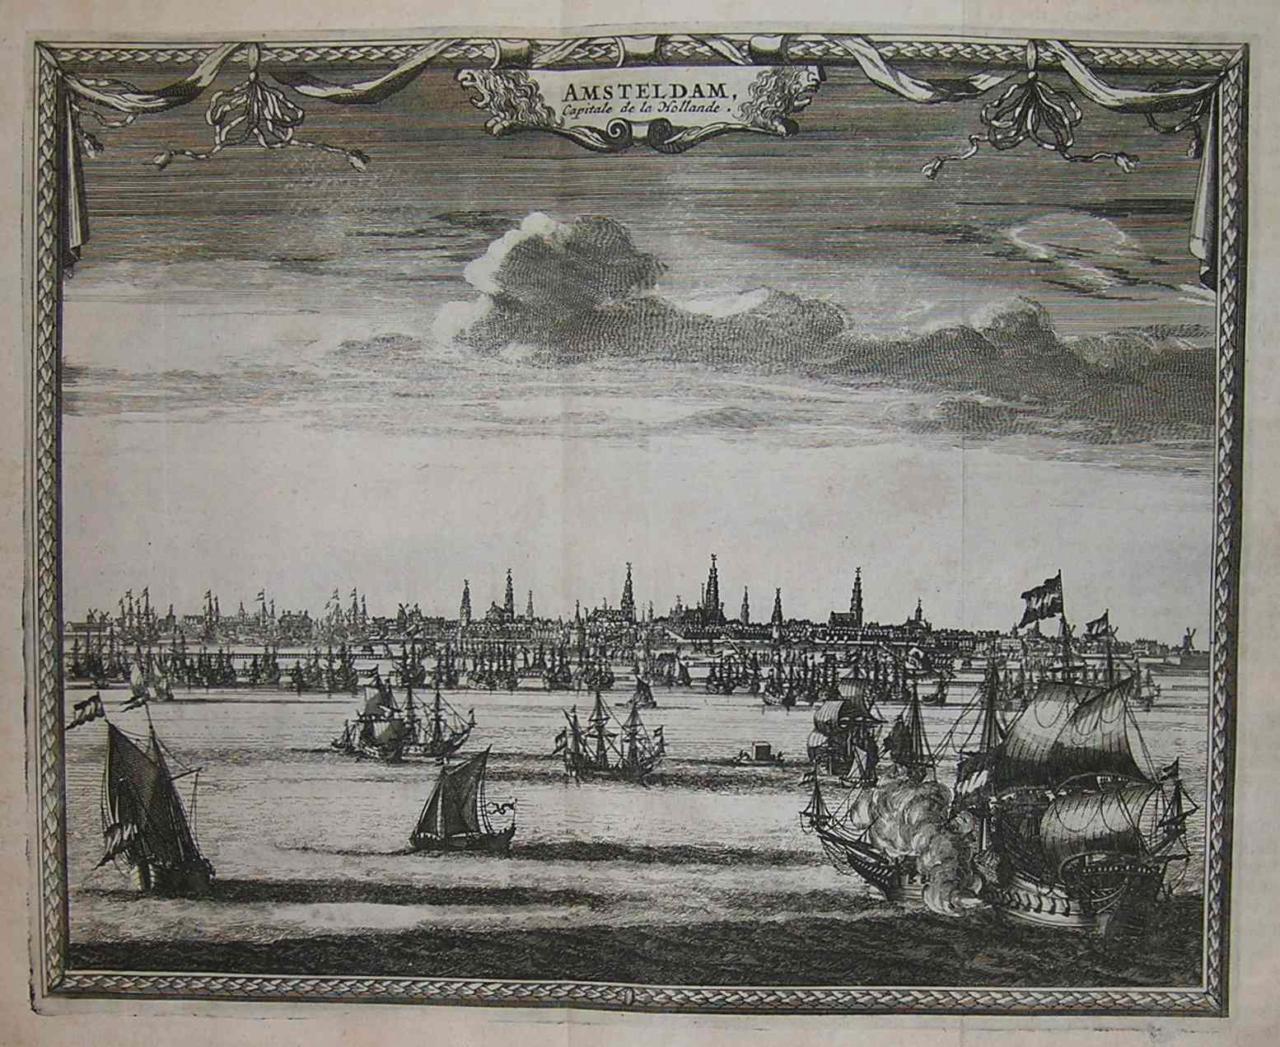 AMSTERDAM AMSTELDAM CAPITALE DE LA HOLLANDE Michael Jennings - Antique maps amsterdam